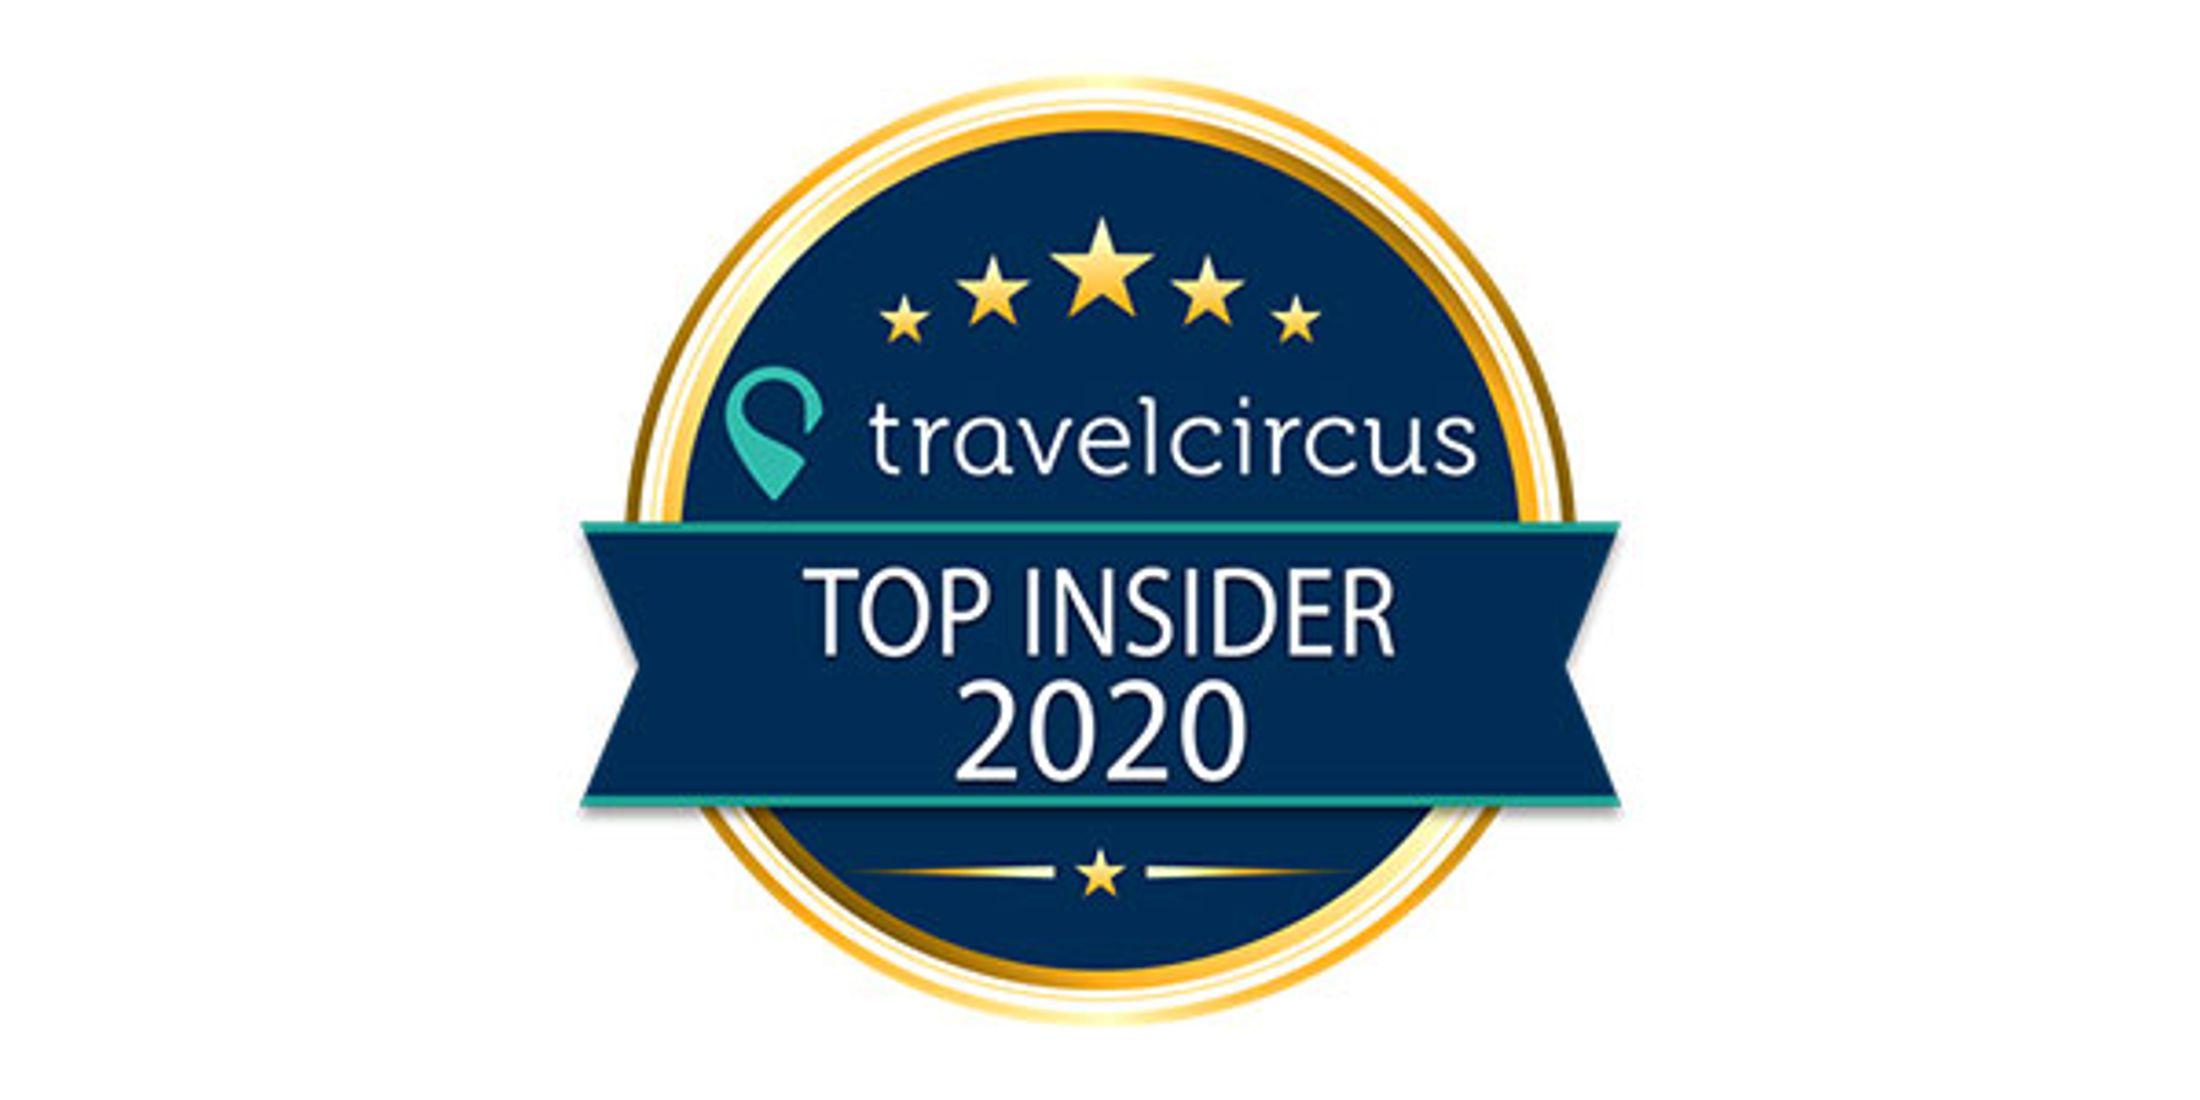 Travelcircus Top Insider 2020